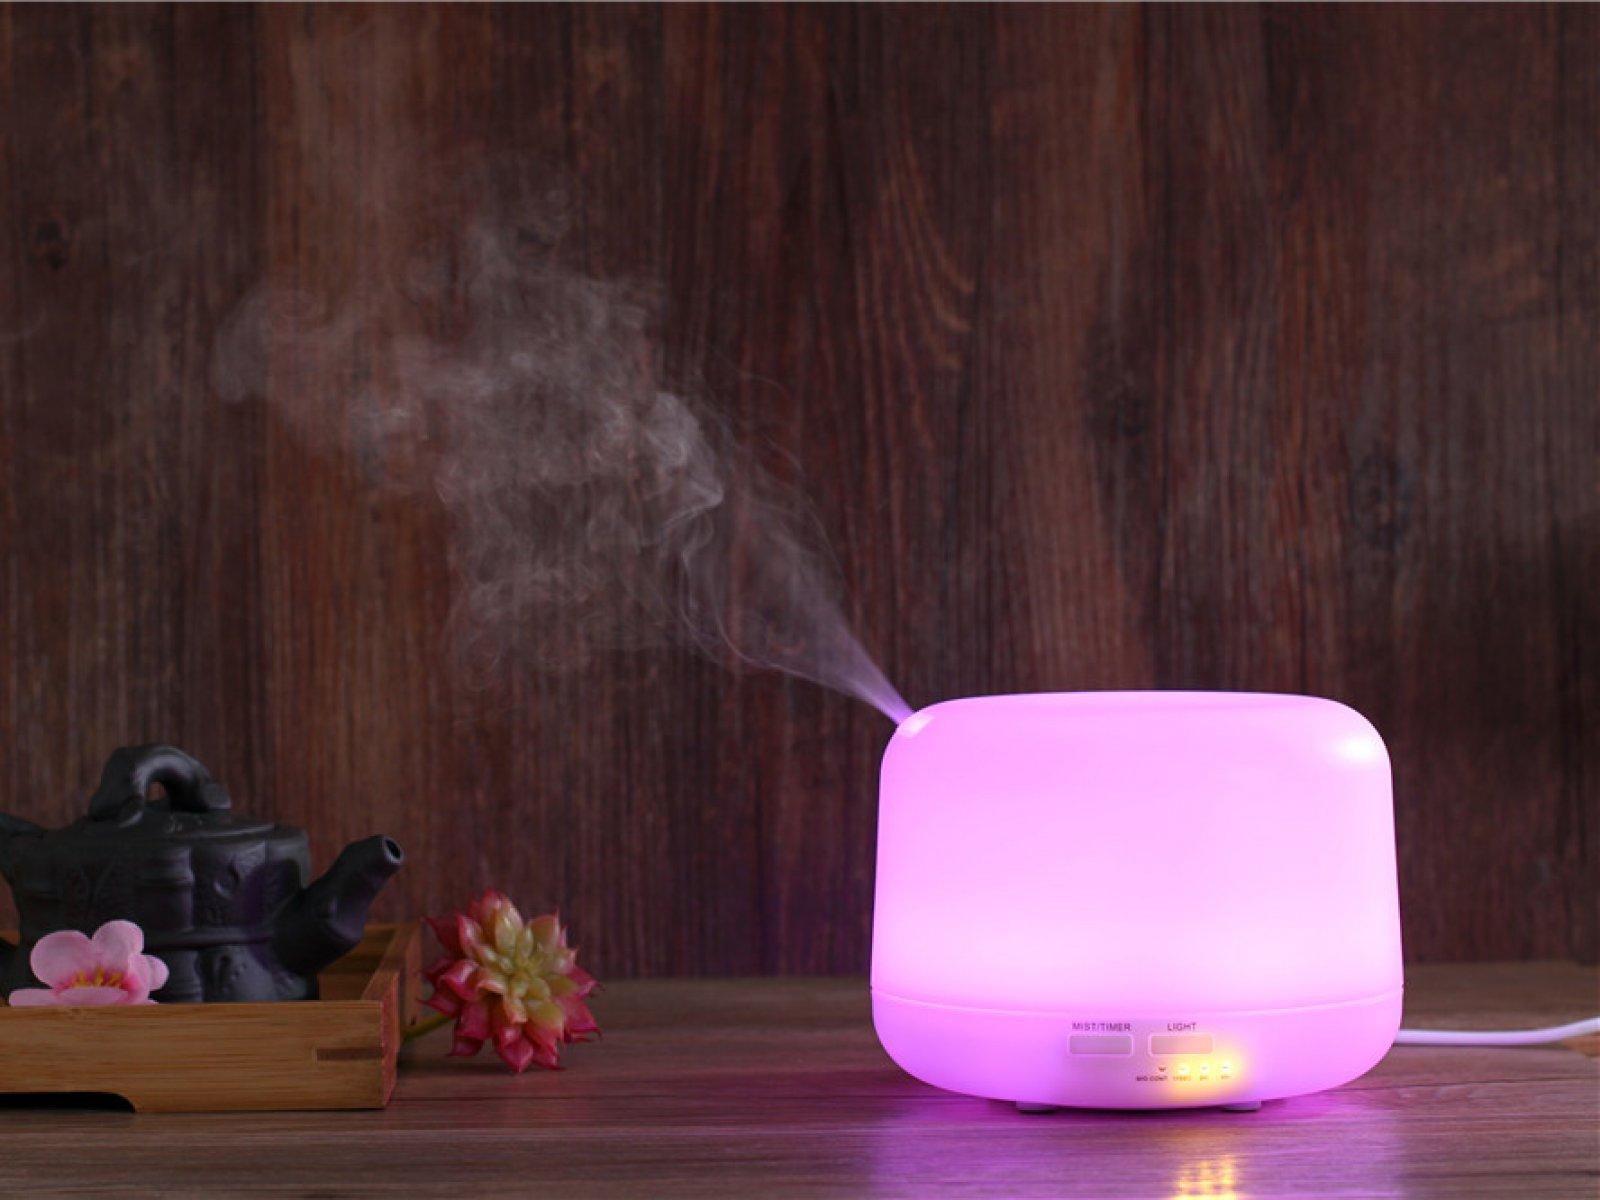 aroma-difuzer-favorit-300-bily-ultrasonicky-aroma-difuzer-aroma-difuzer-difuzer-etericky-difuzer-aroma-lampa-favorit-thumbnail-1592483107-YD-017-3-